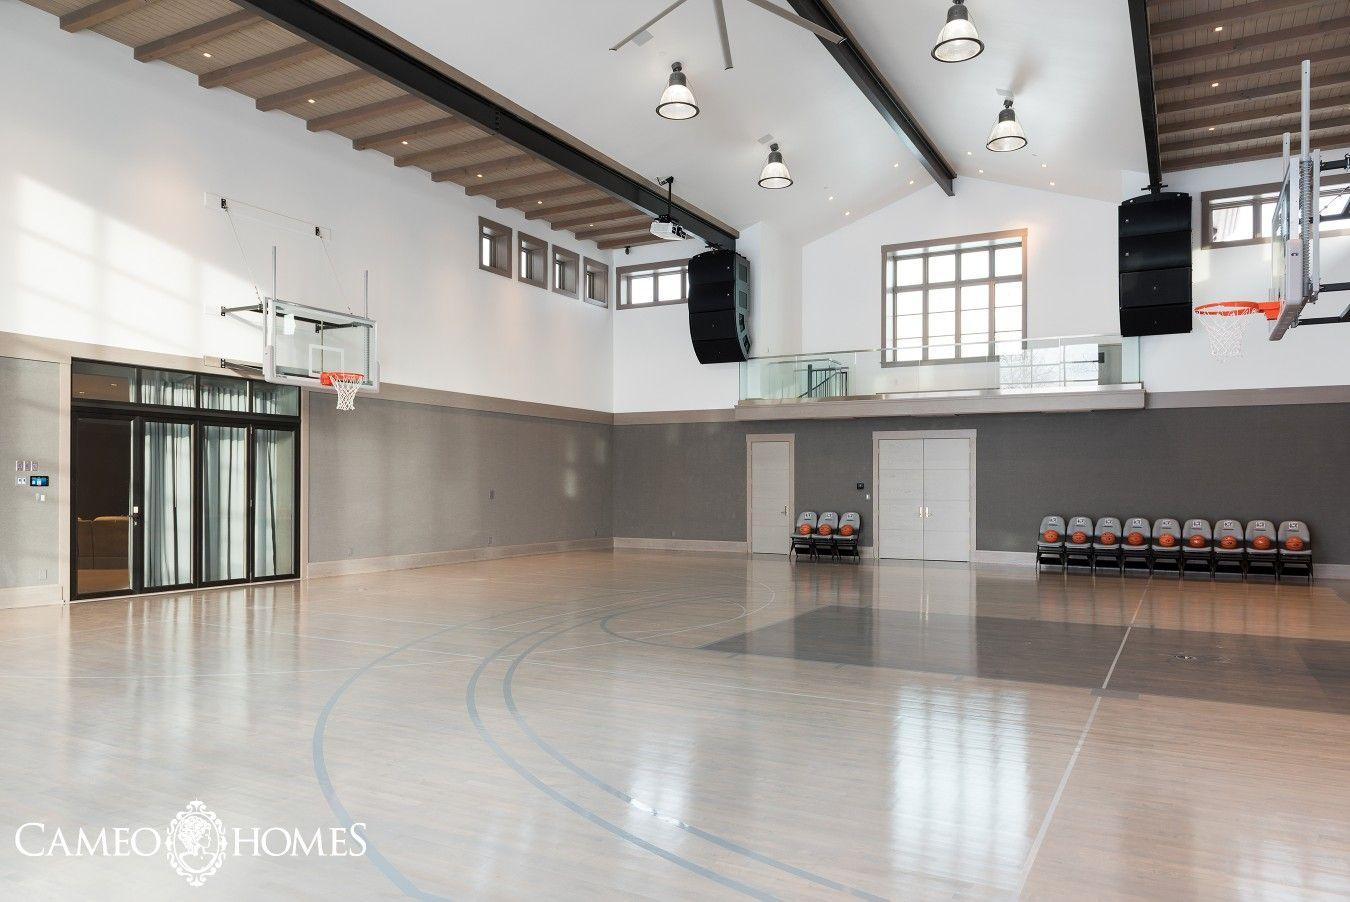 Home Basketball Court Home Basketball Court Basketball Court Basketball Court Backyard